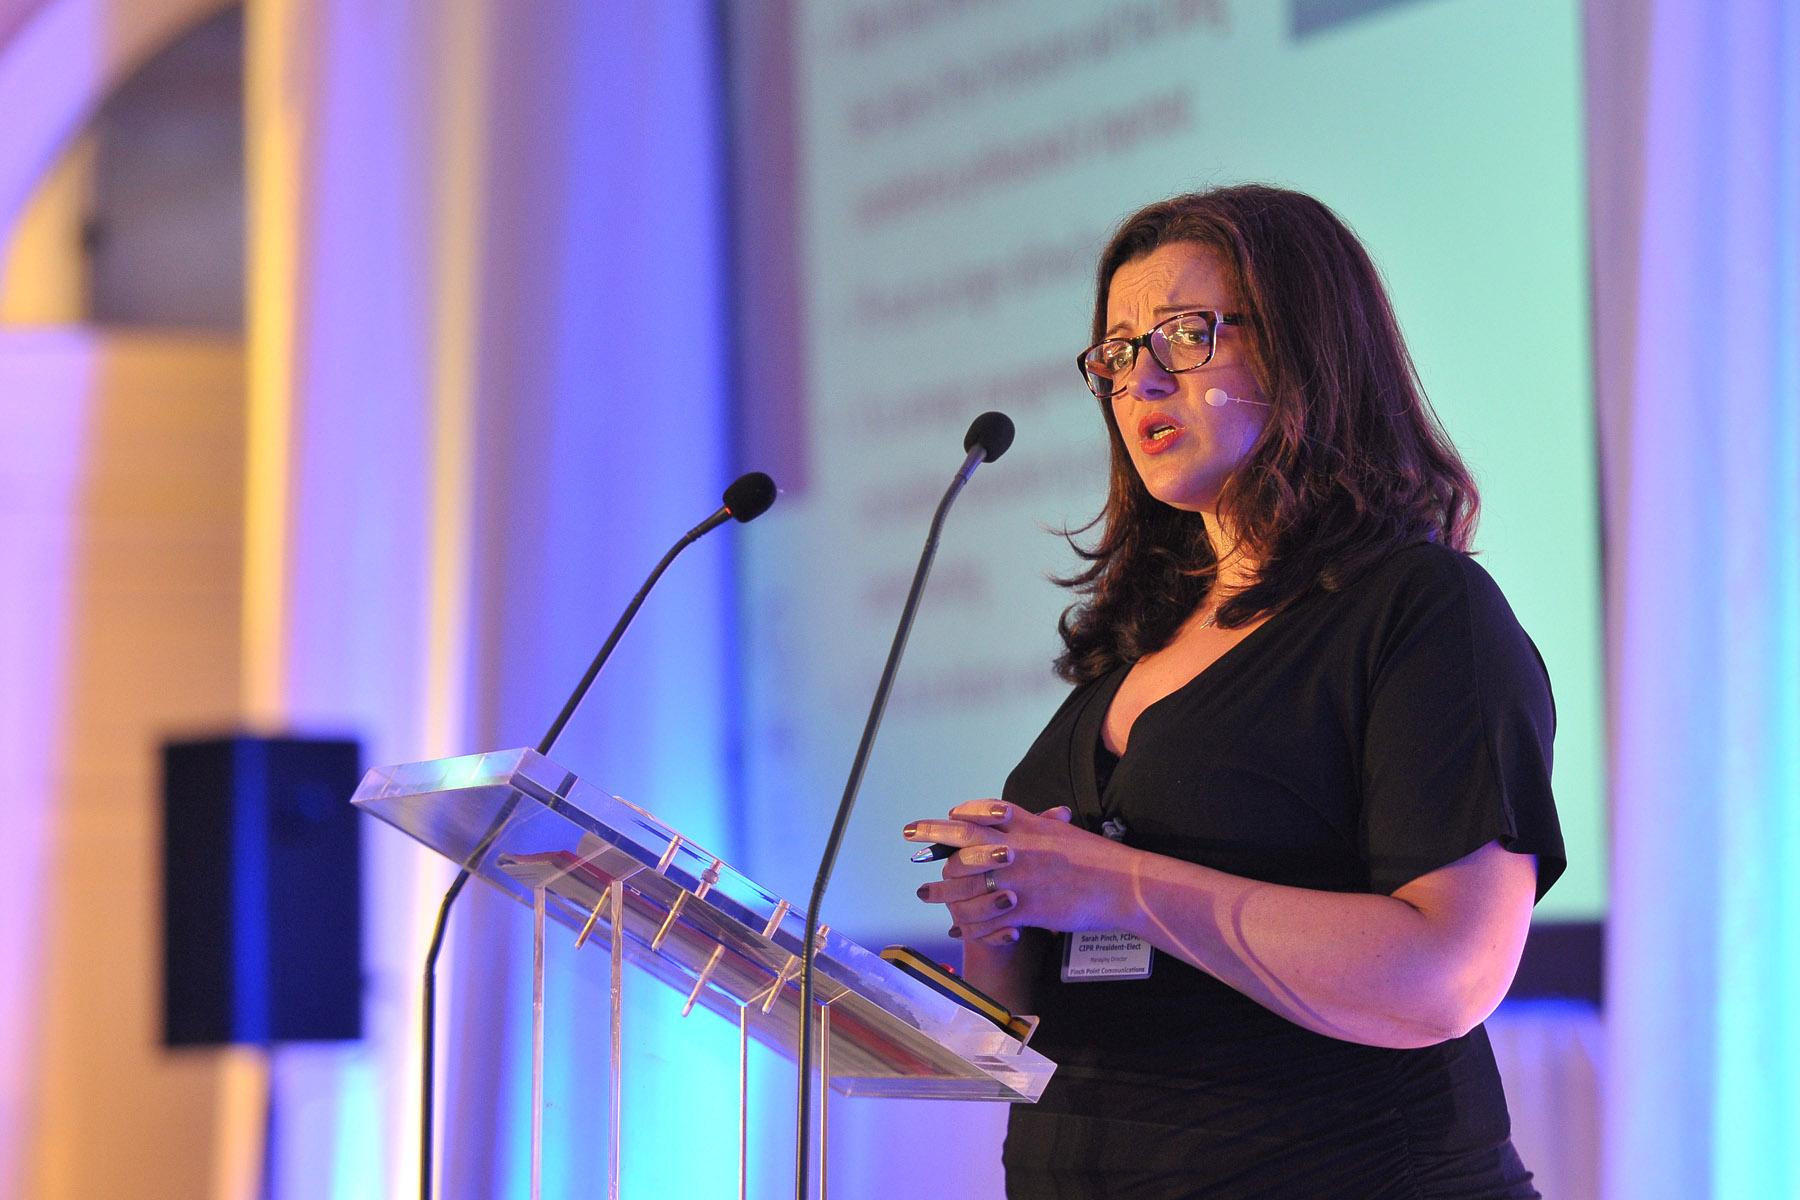 Sarah Pinch presenting